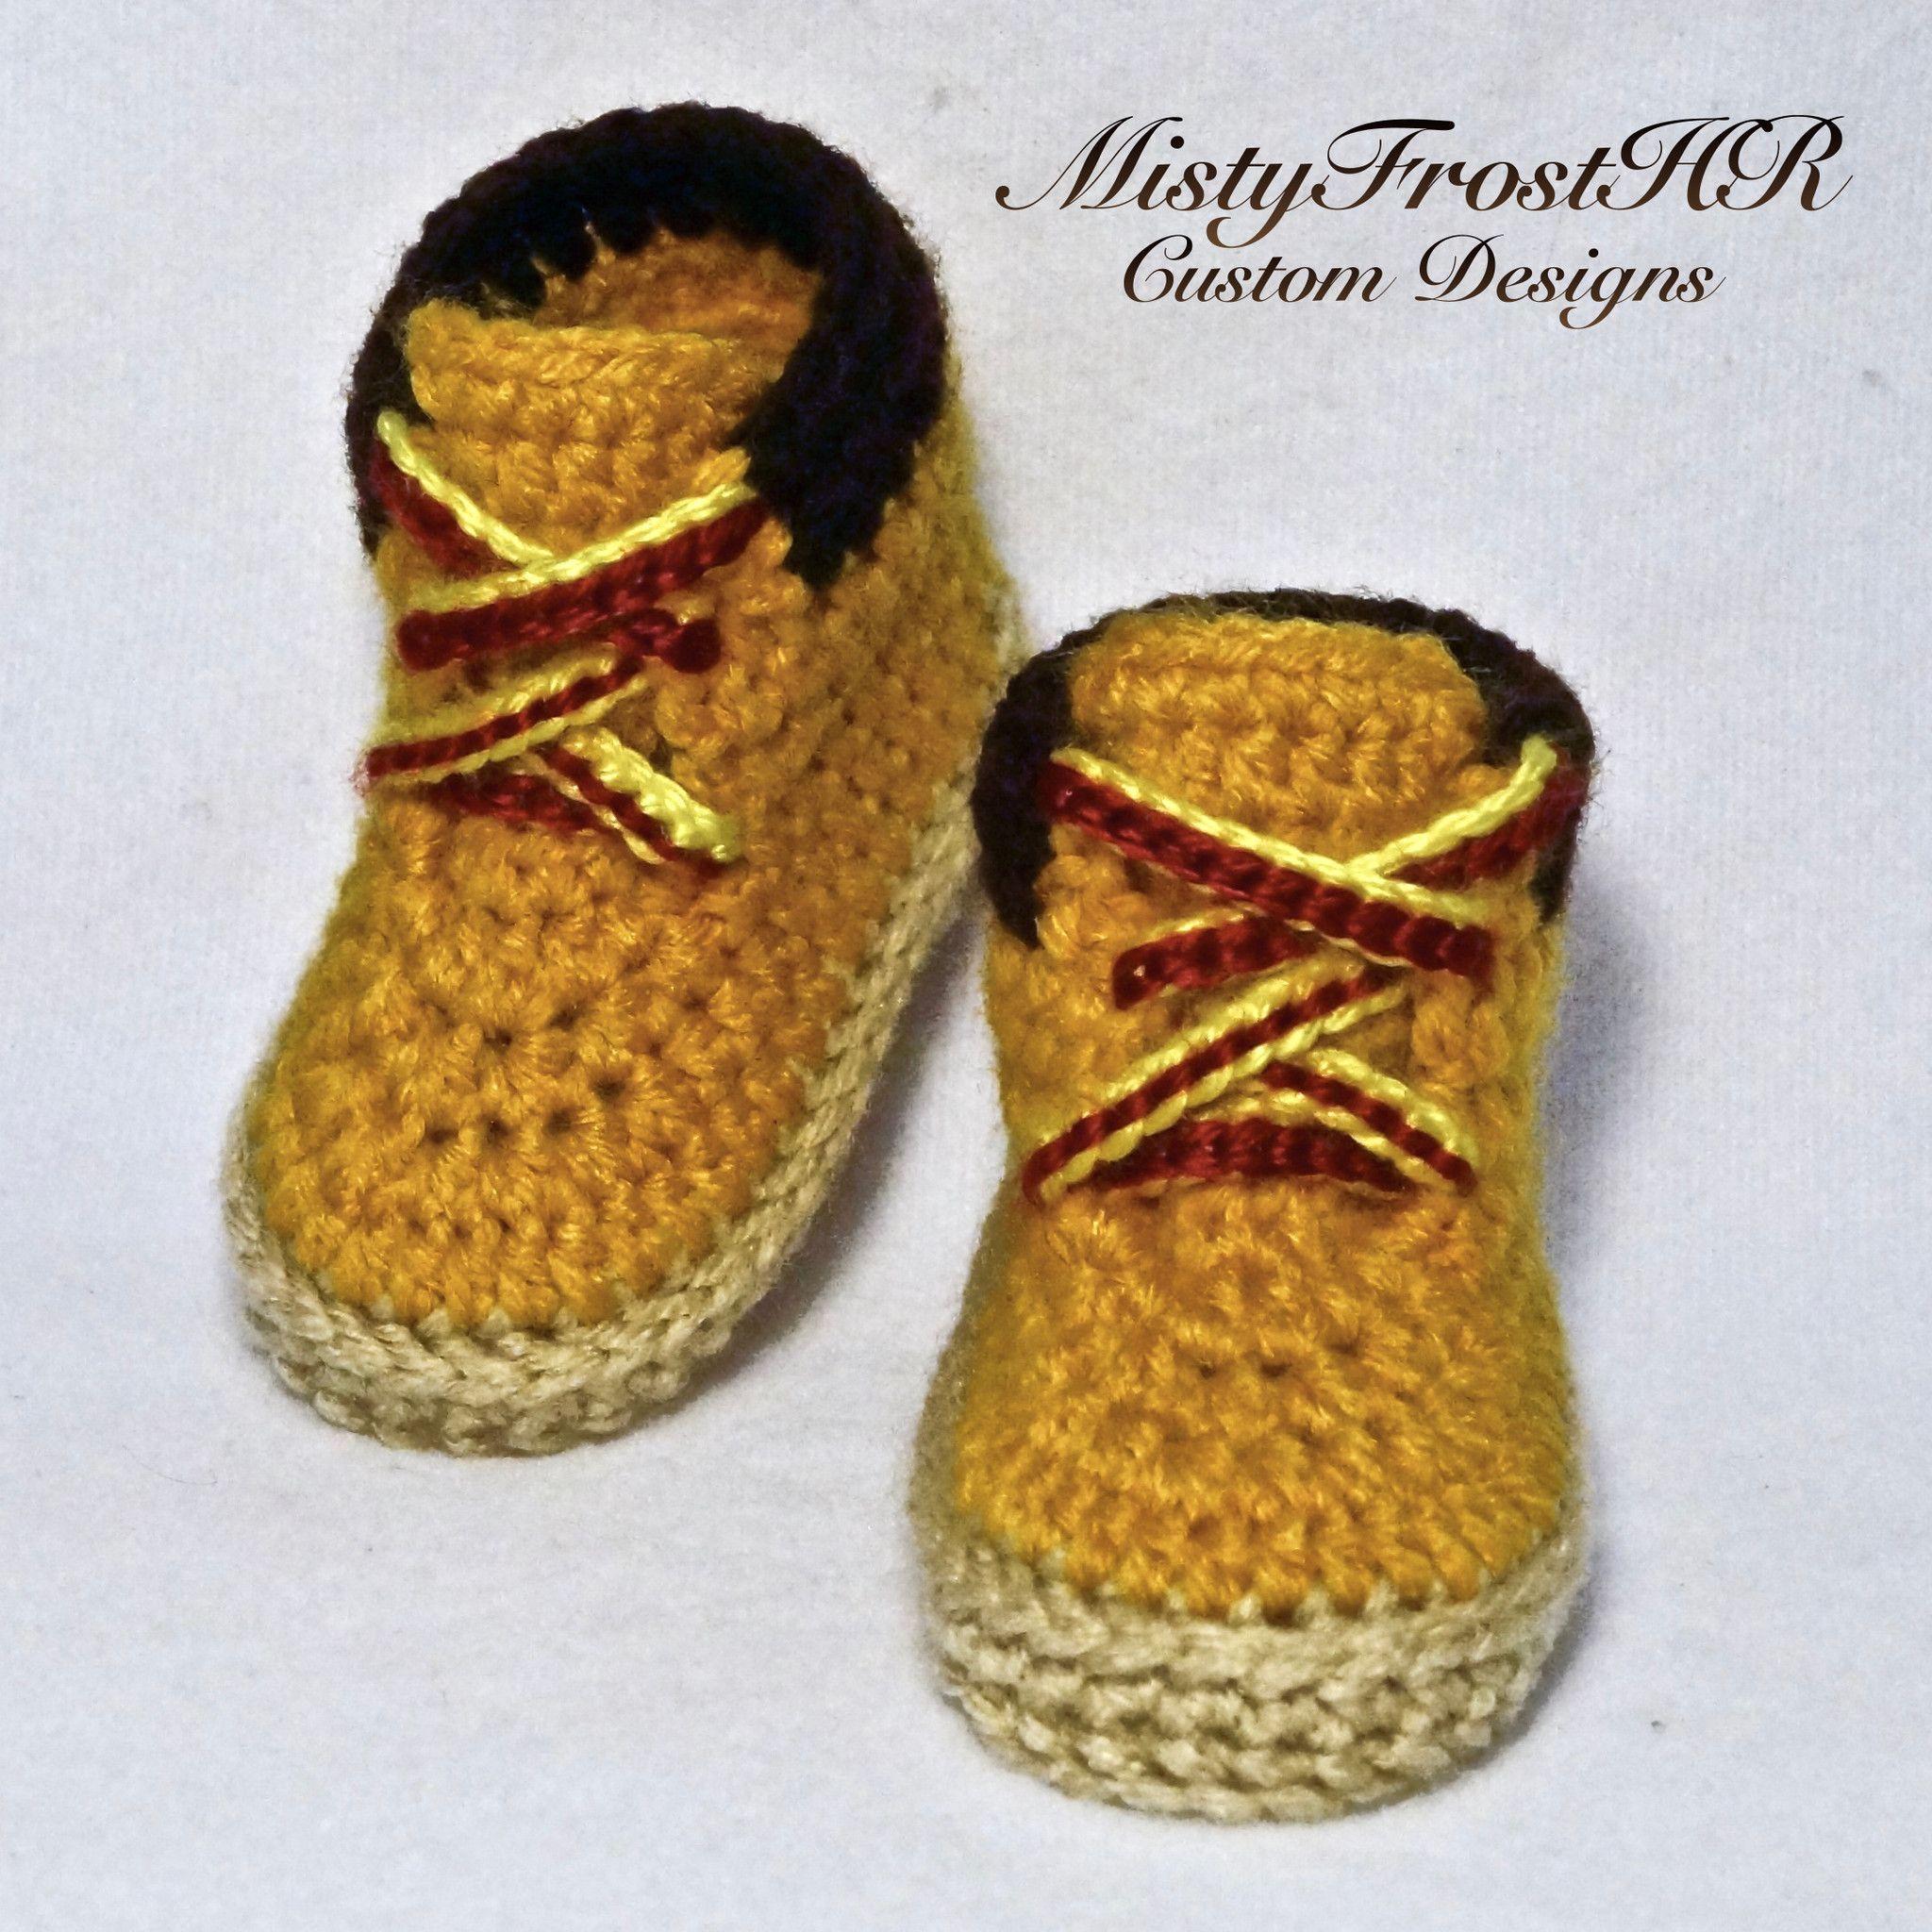 Crochet Timberland Inspired Workboots | Häckeln und Häkeln